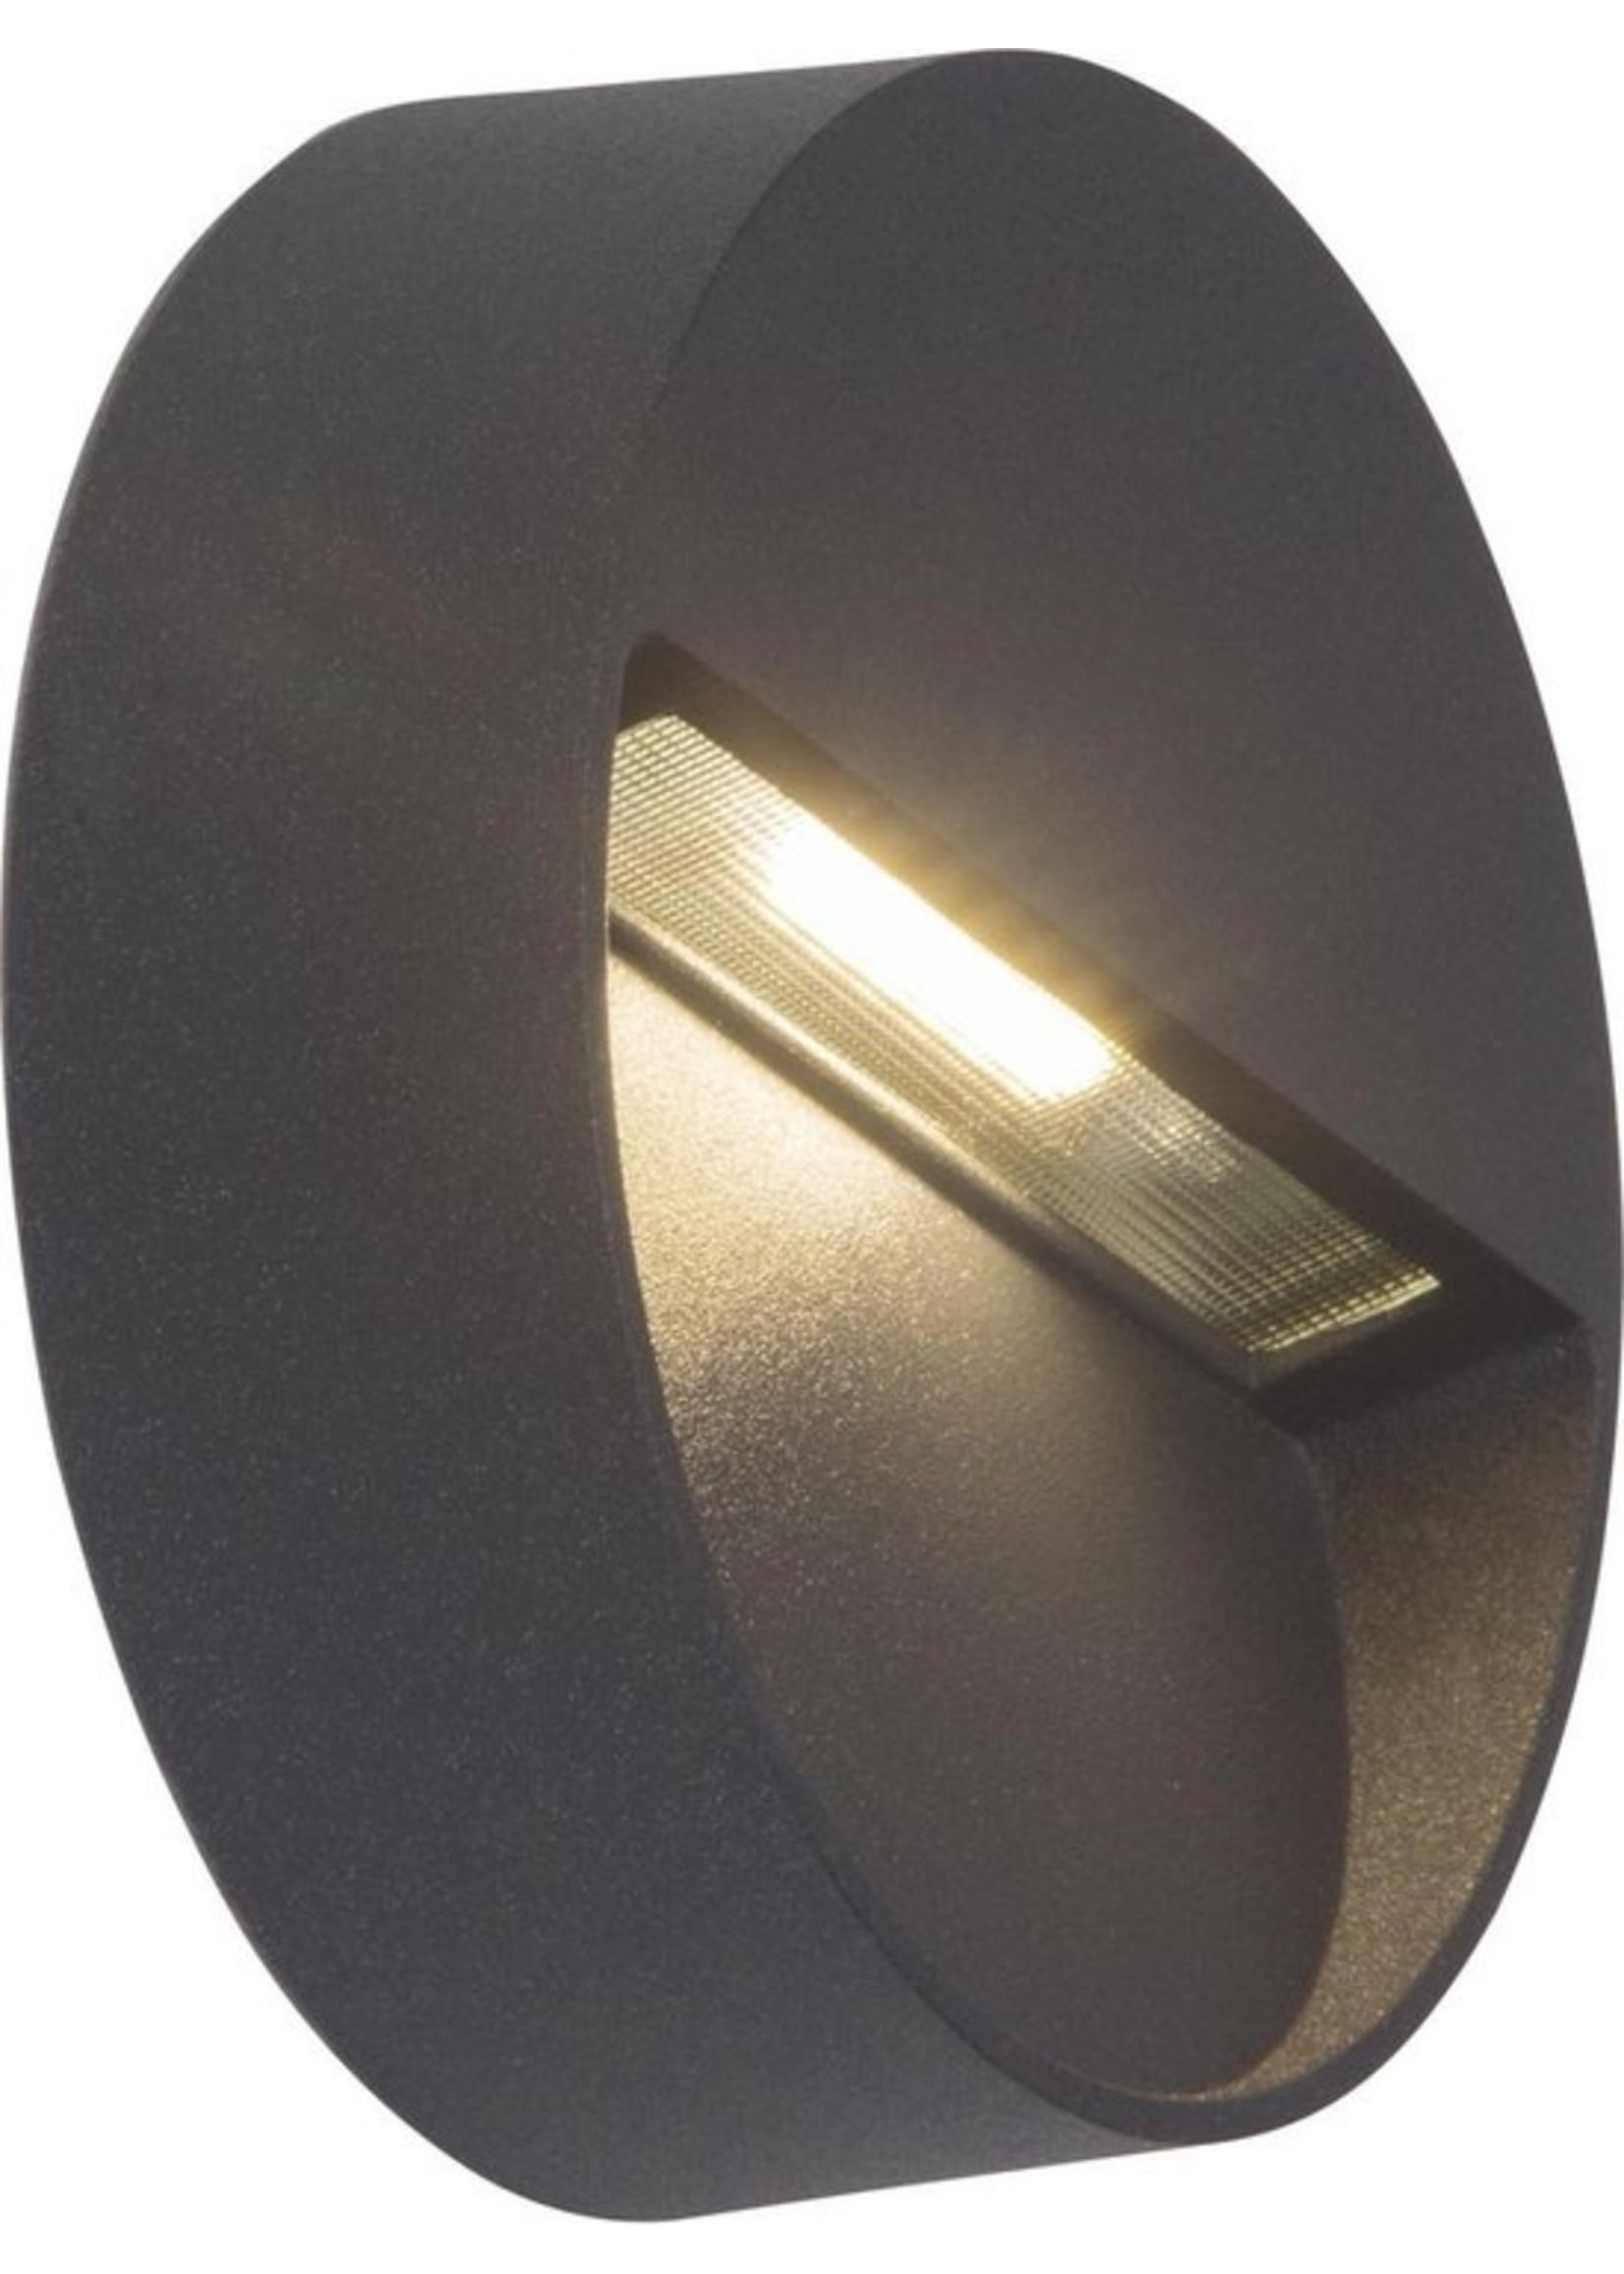 AEG AEG lamp voor LED buitenwandlamp rond antraciet | 1x 3W LED